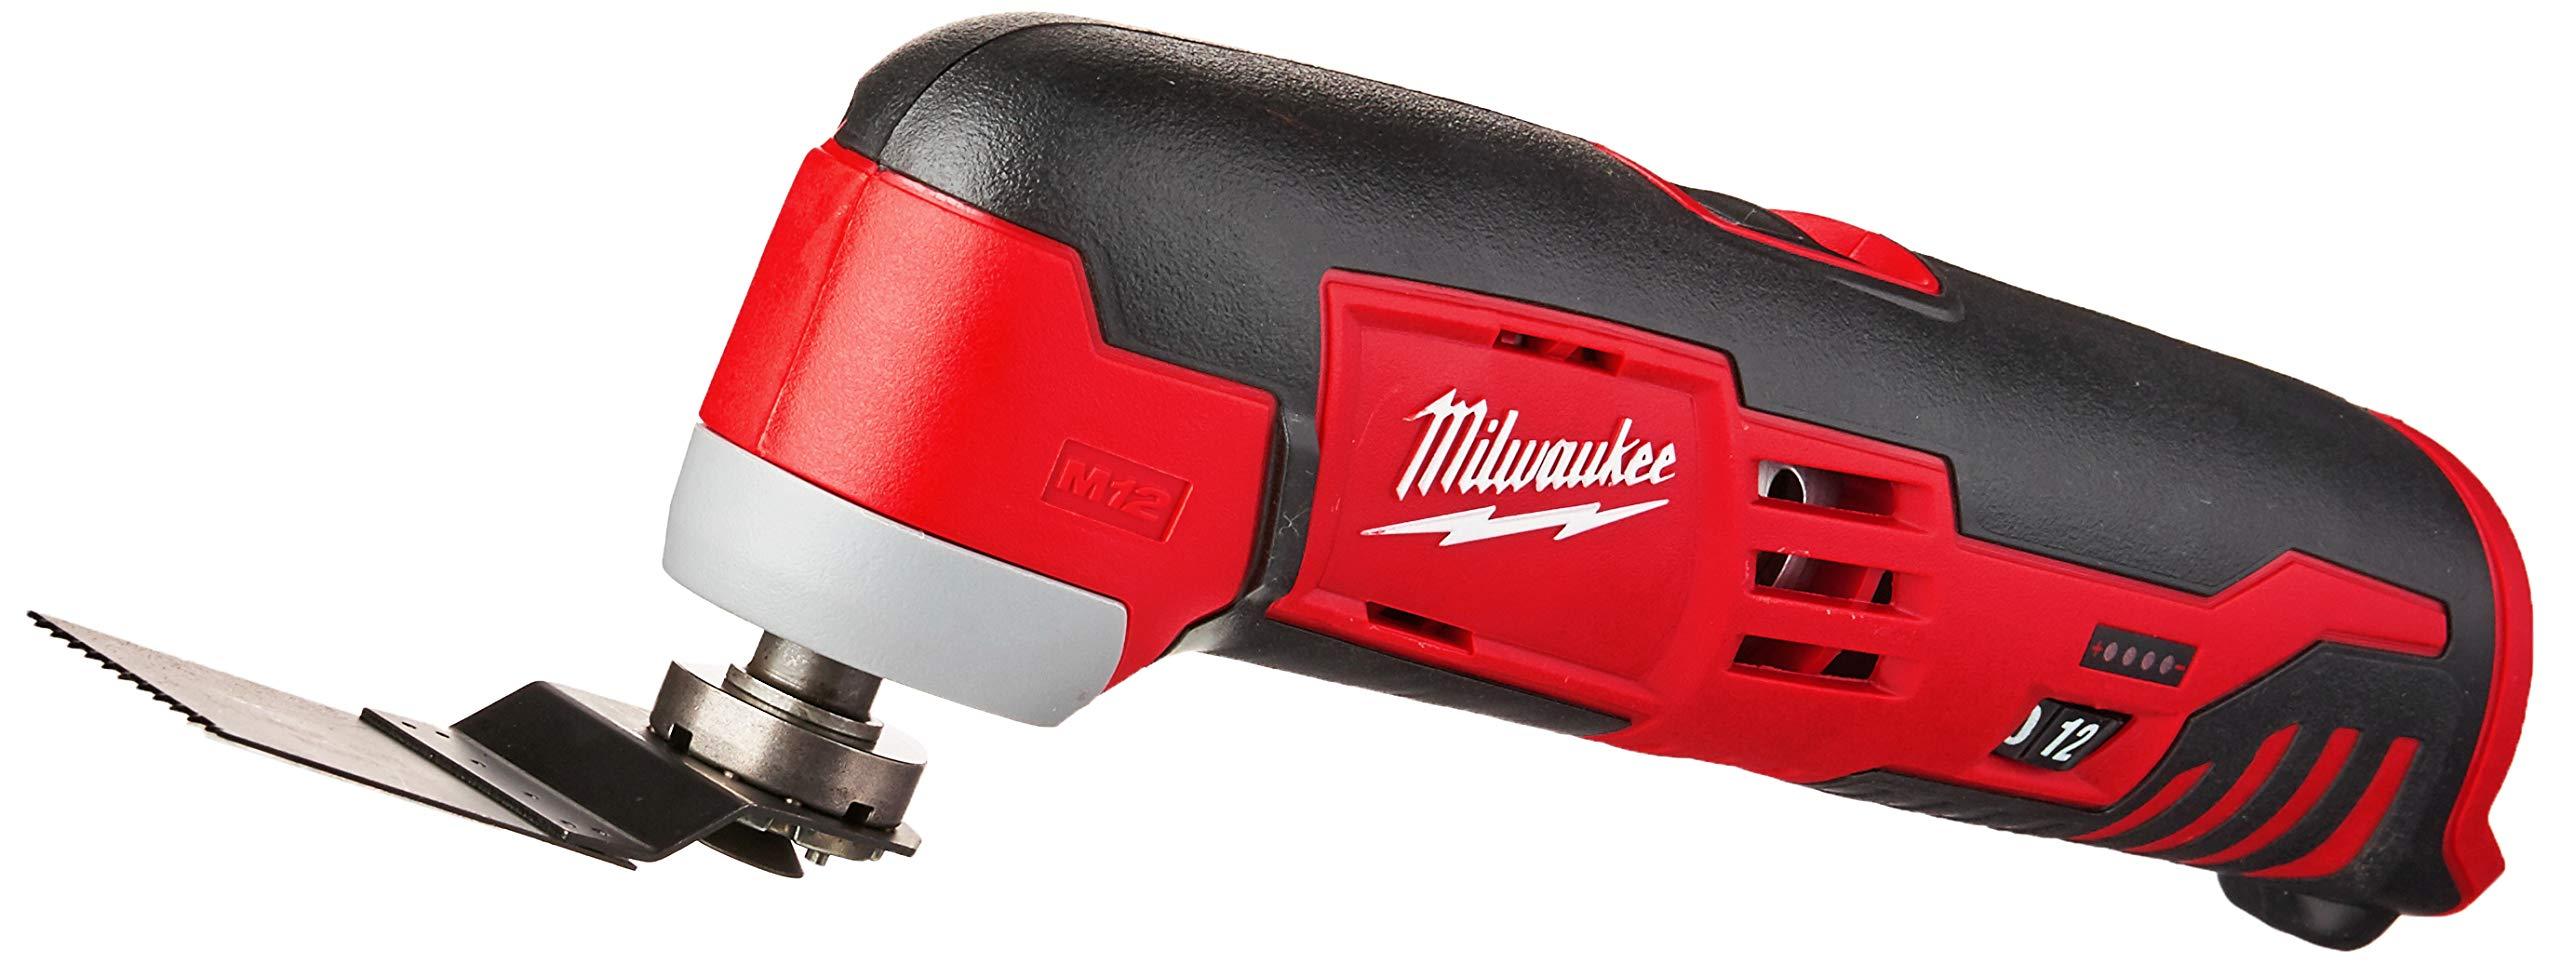 Milwaukee 2426 20 Redlithium Multi Use Multi Grit